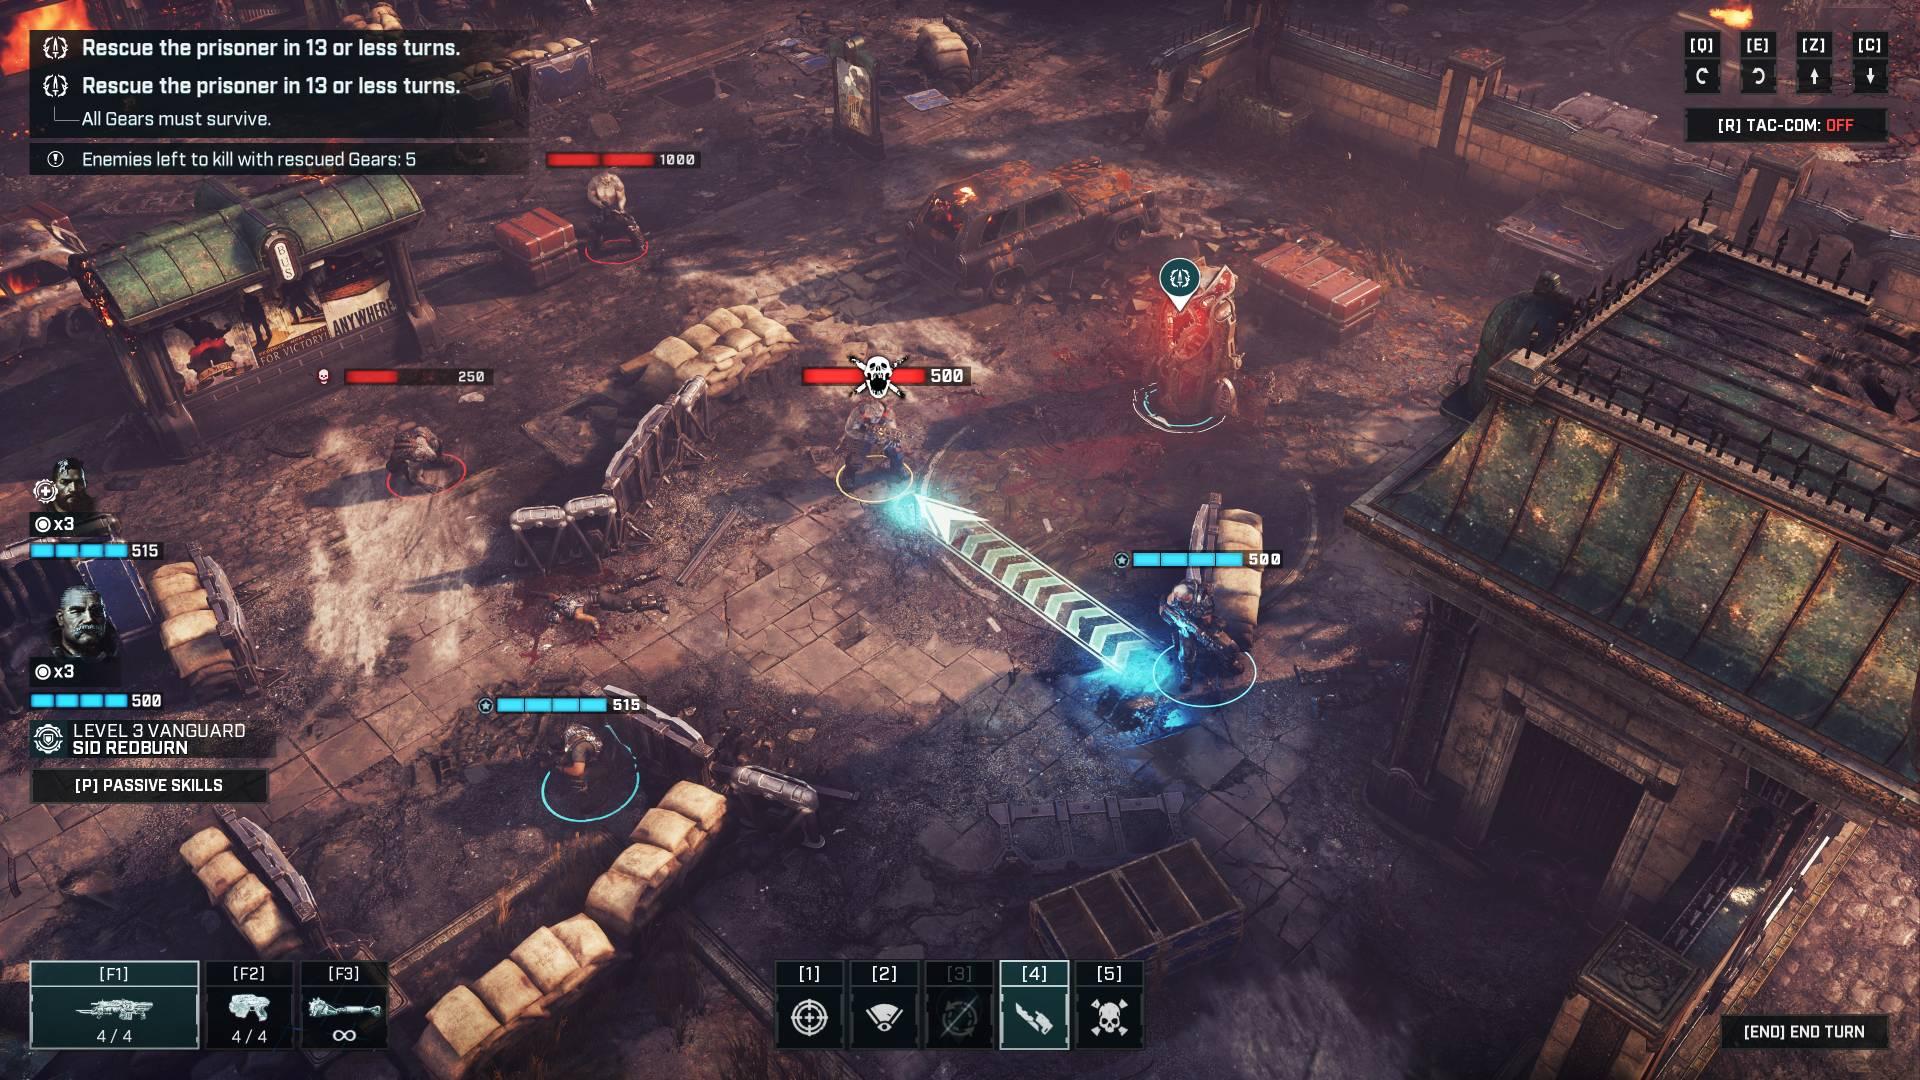 gears tactics img 5 - Recensione Gears Tactics